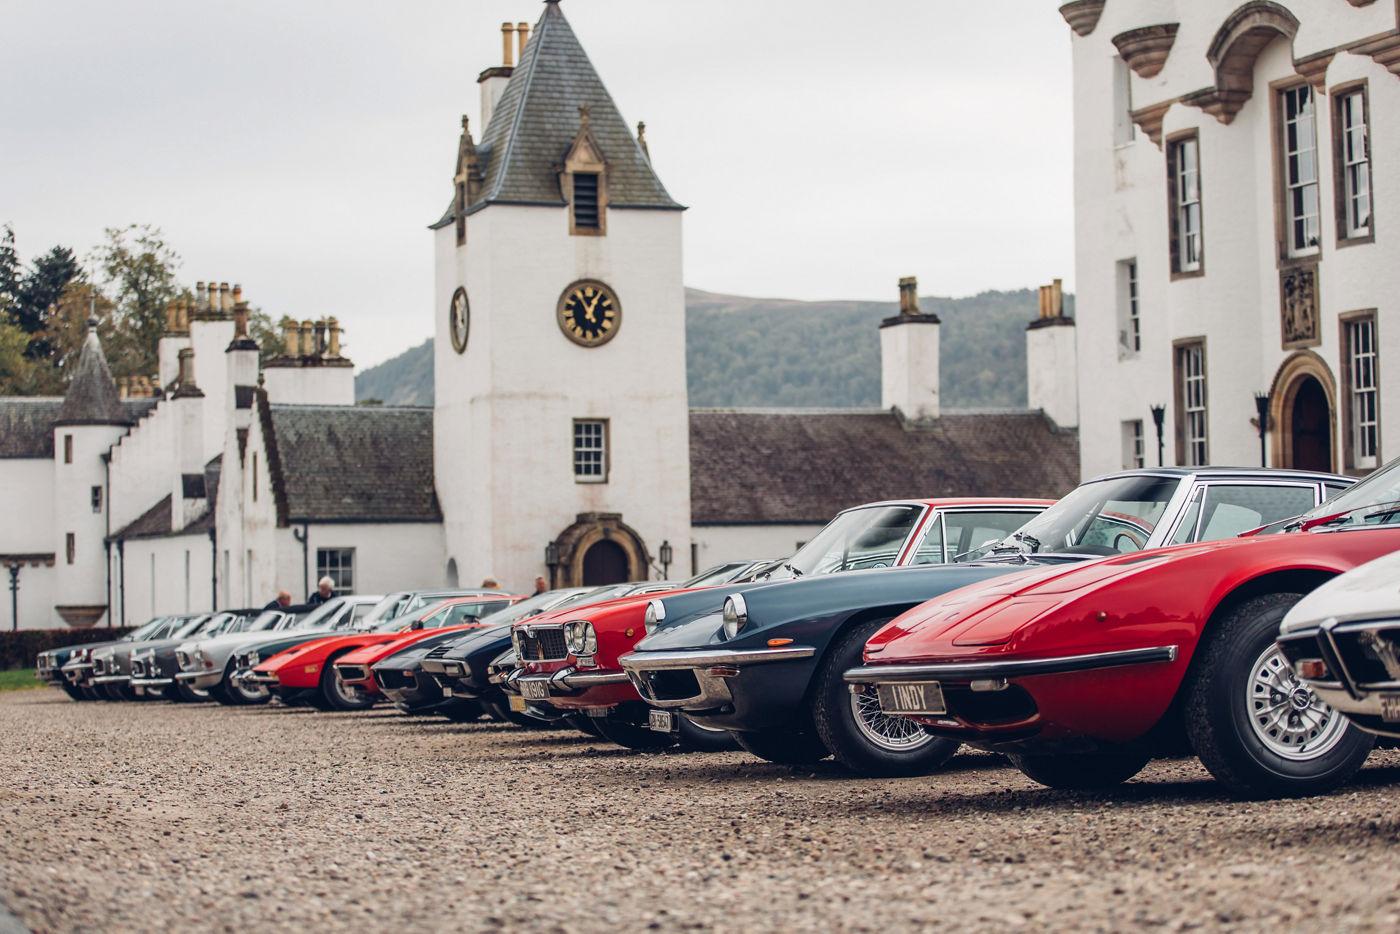 Maserati International Rally 2019 - Maserati at Blair Castle